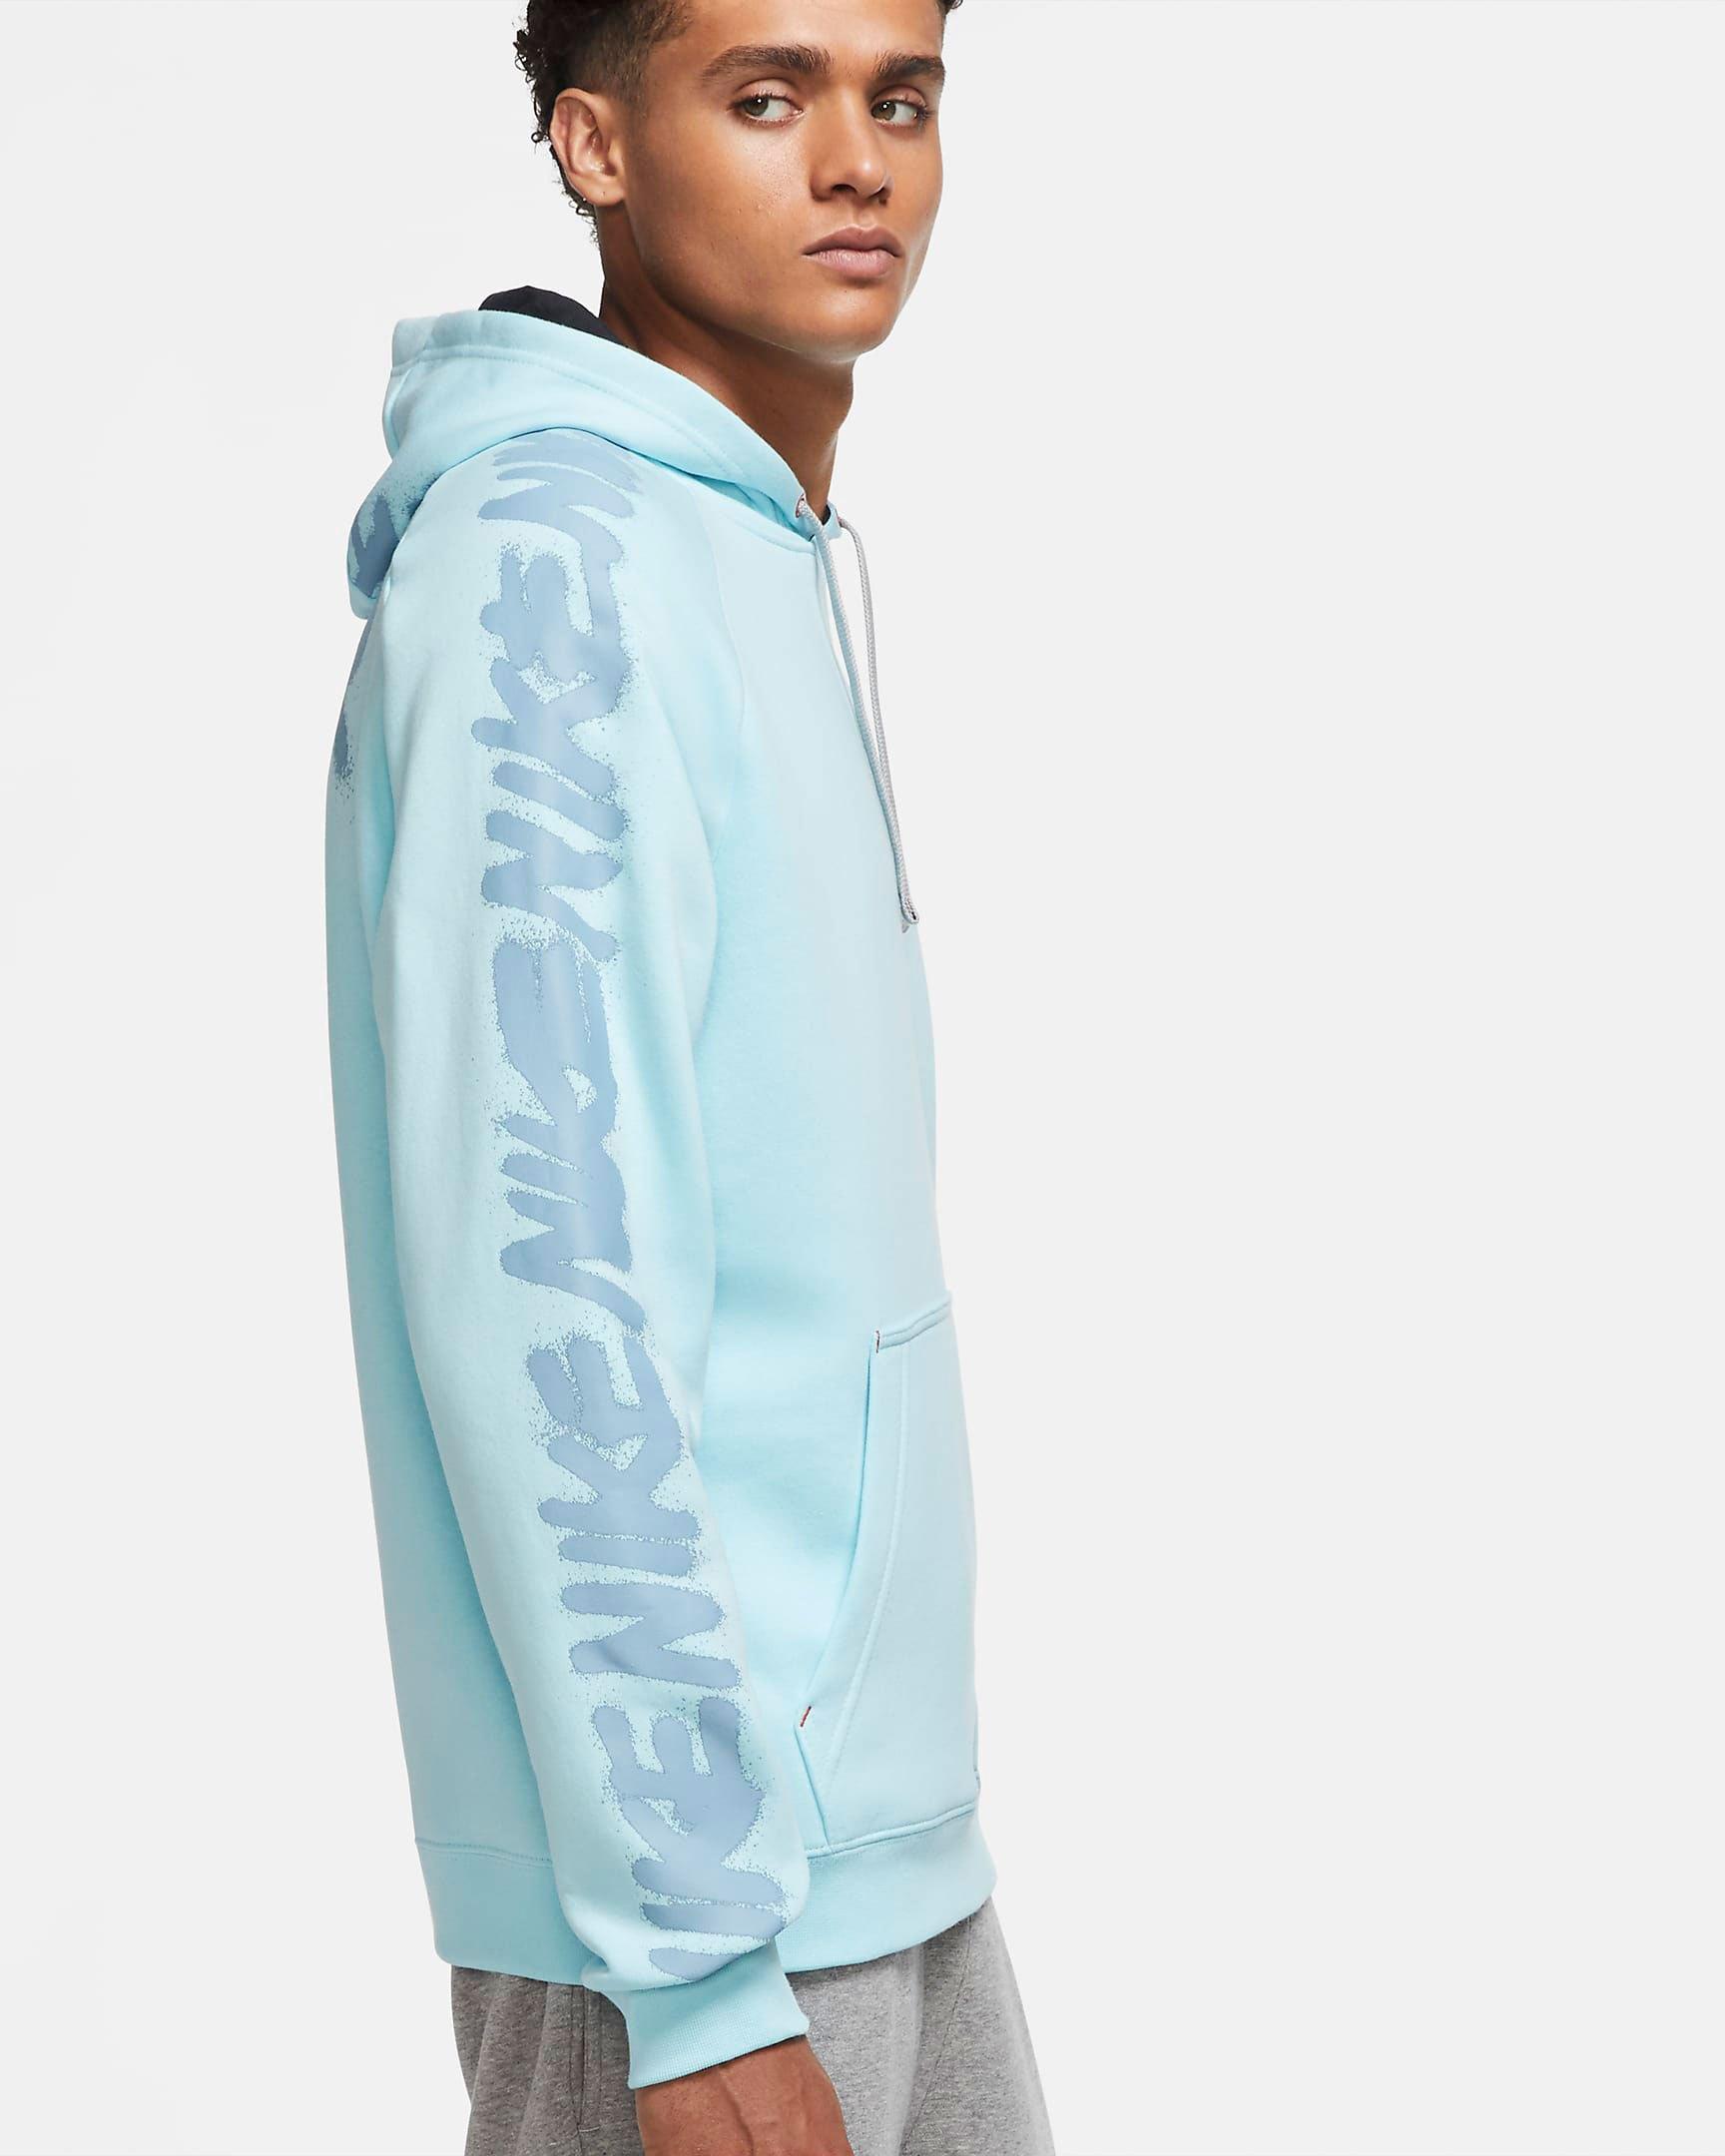 nike-sportswear-spray-paint-club-hoodie-blue-3